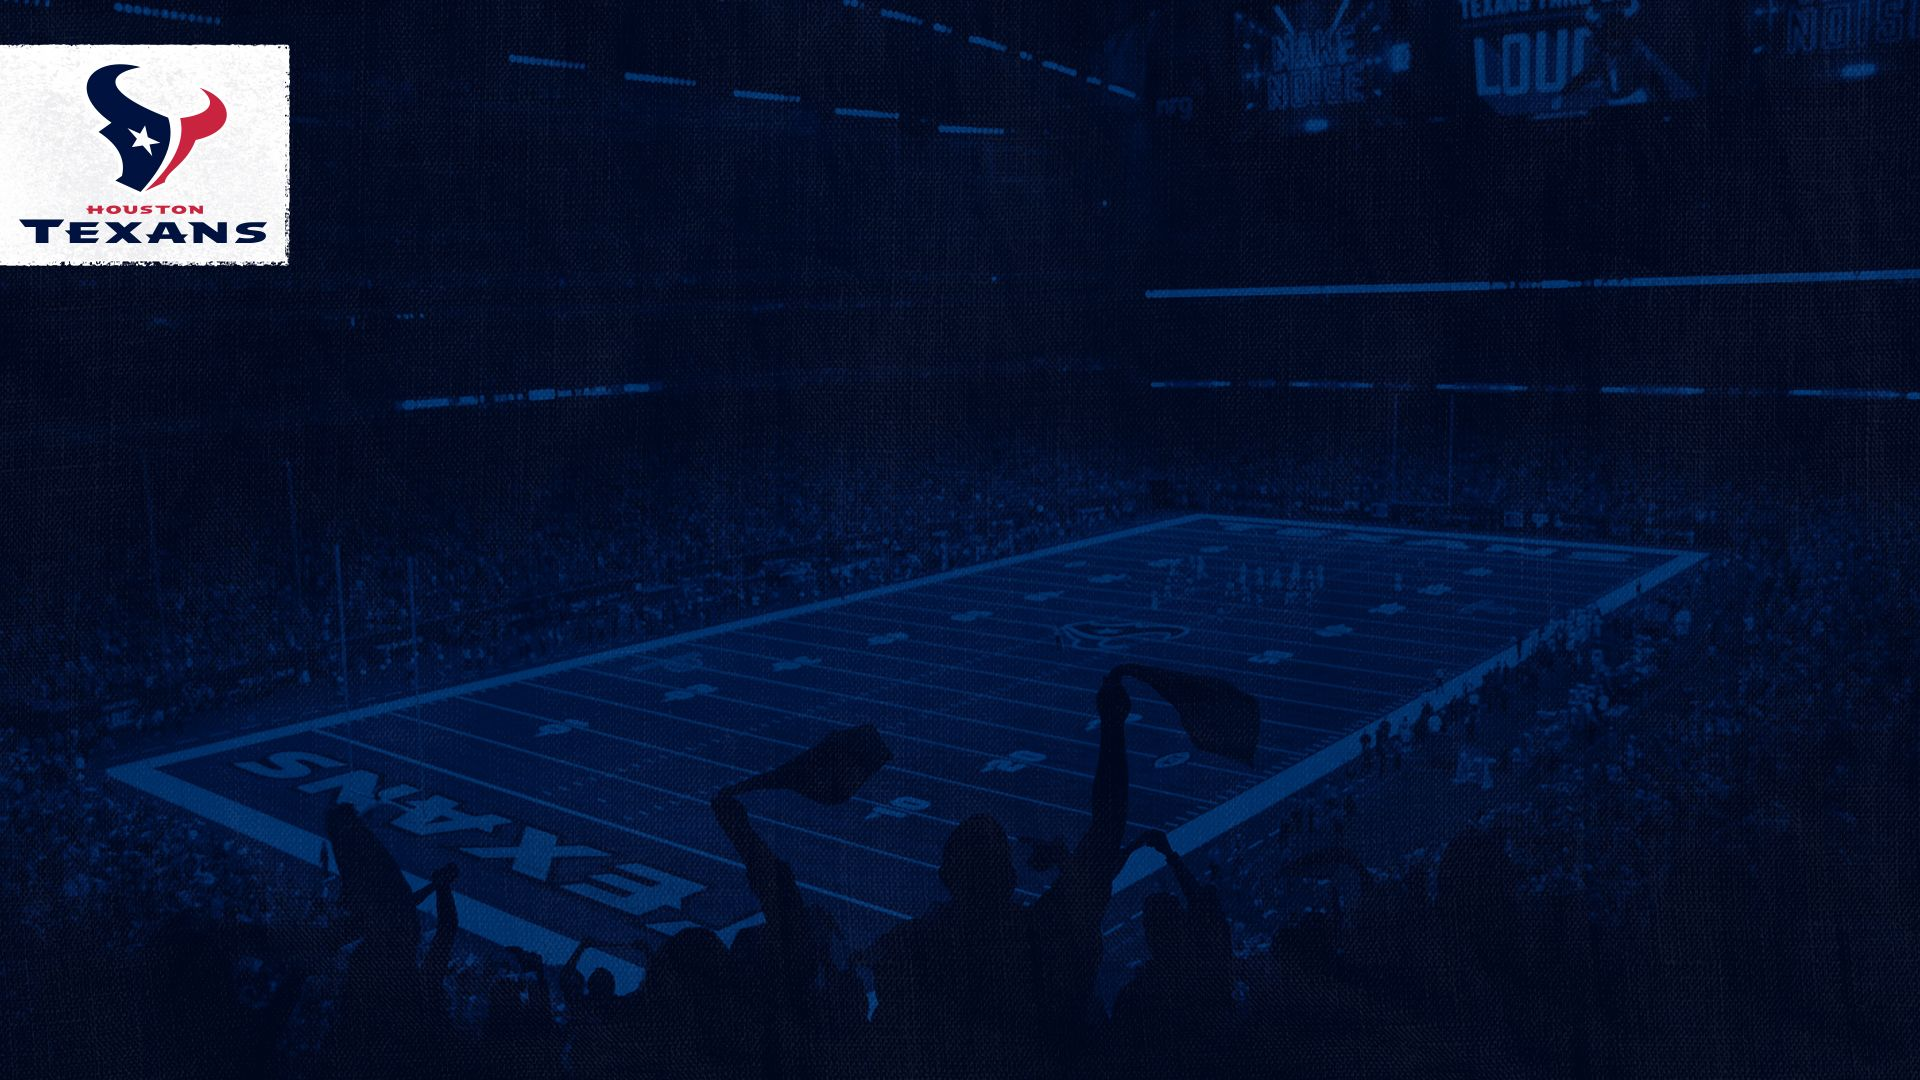 Zoom_Texans_1920x1080_Stadium_V2